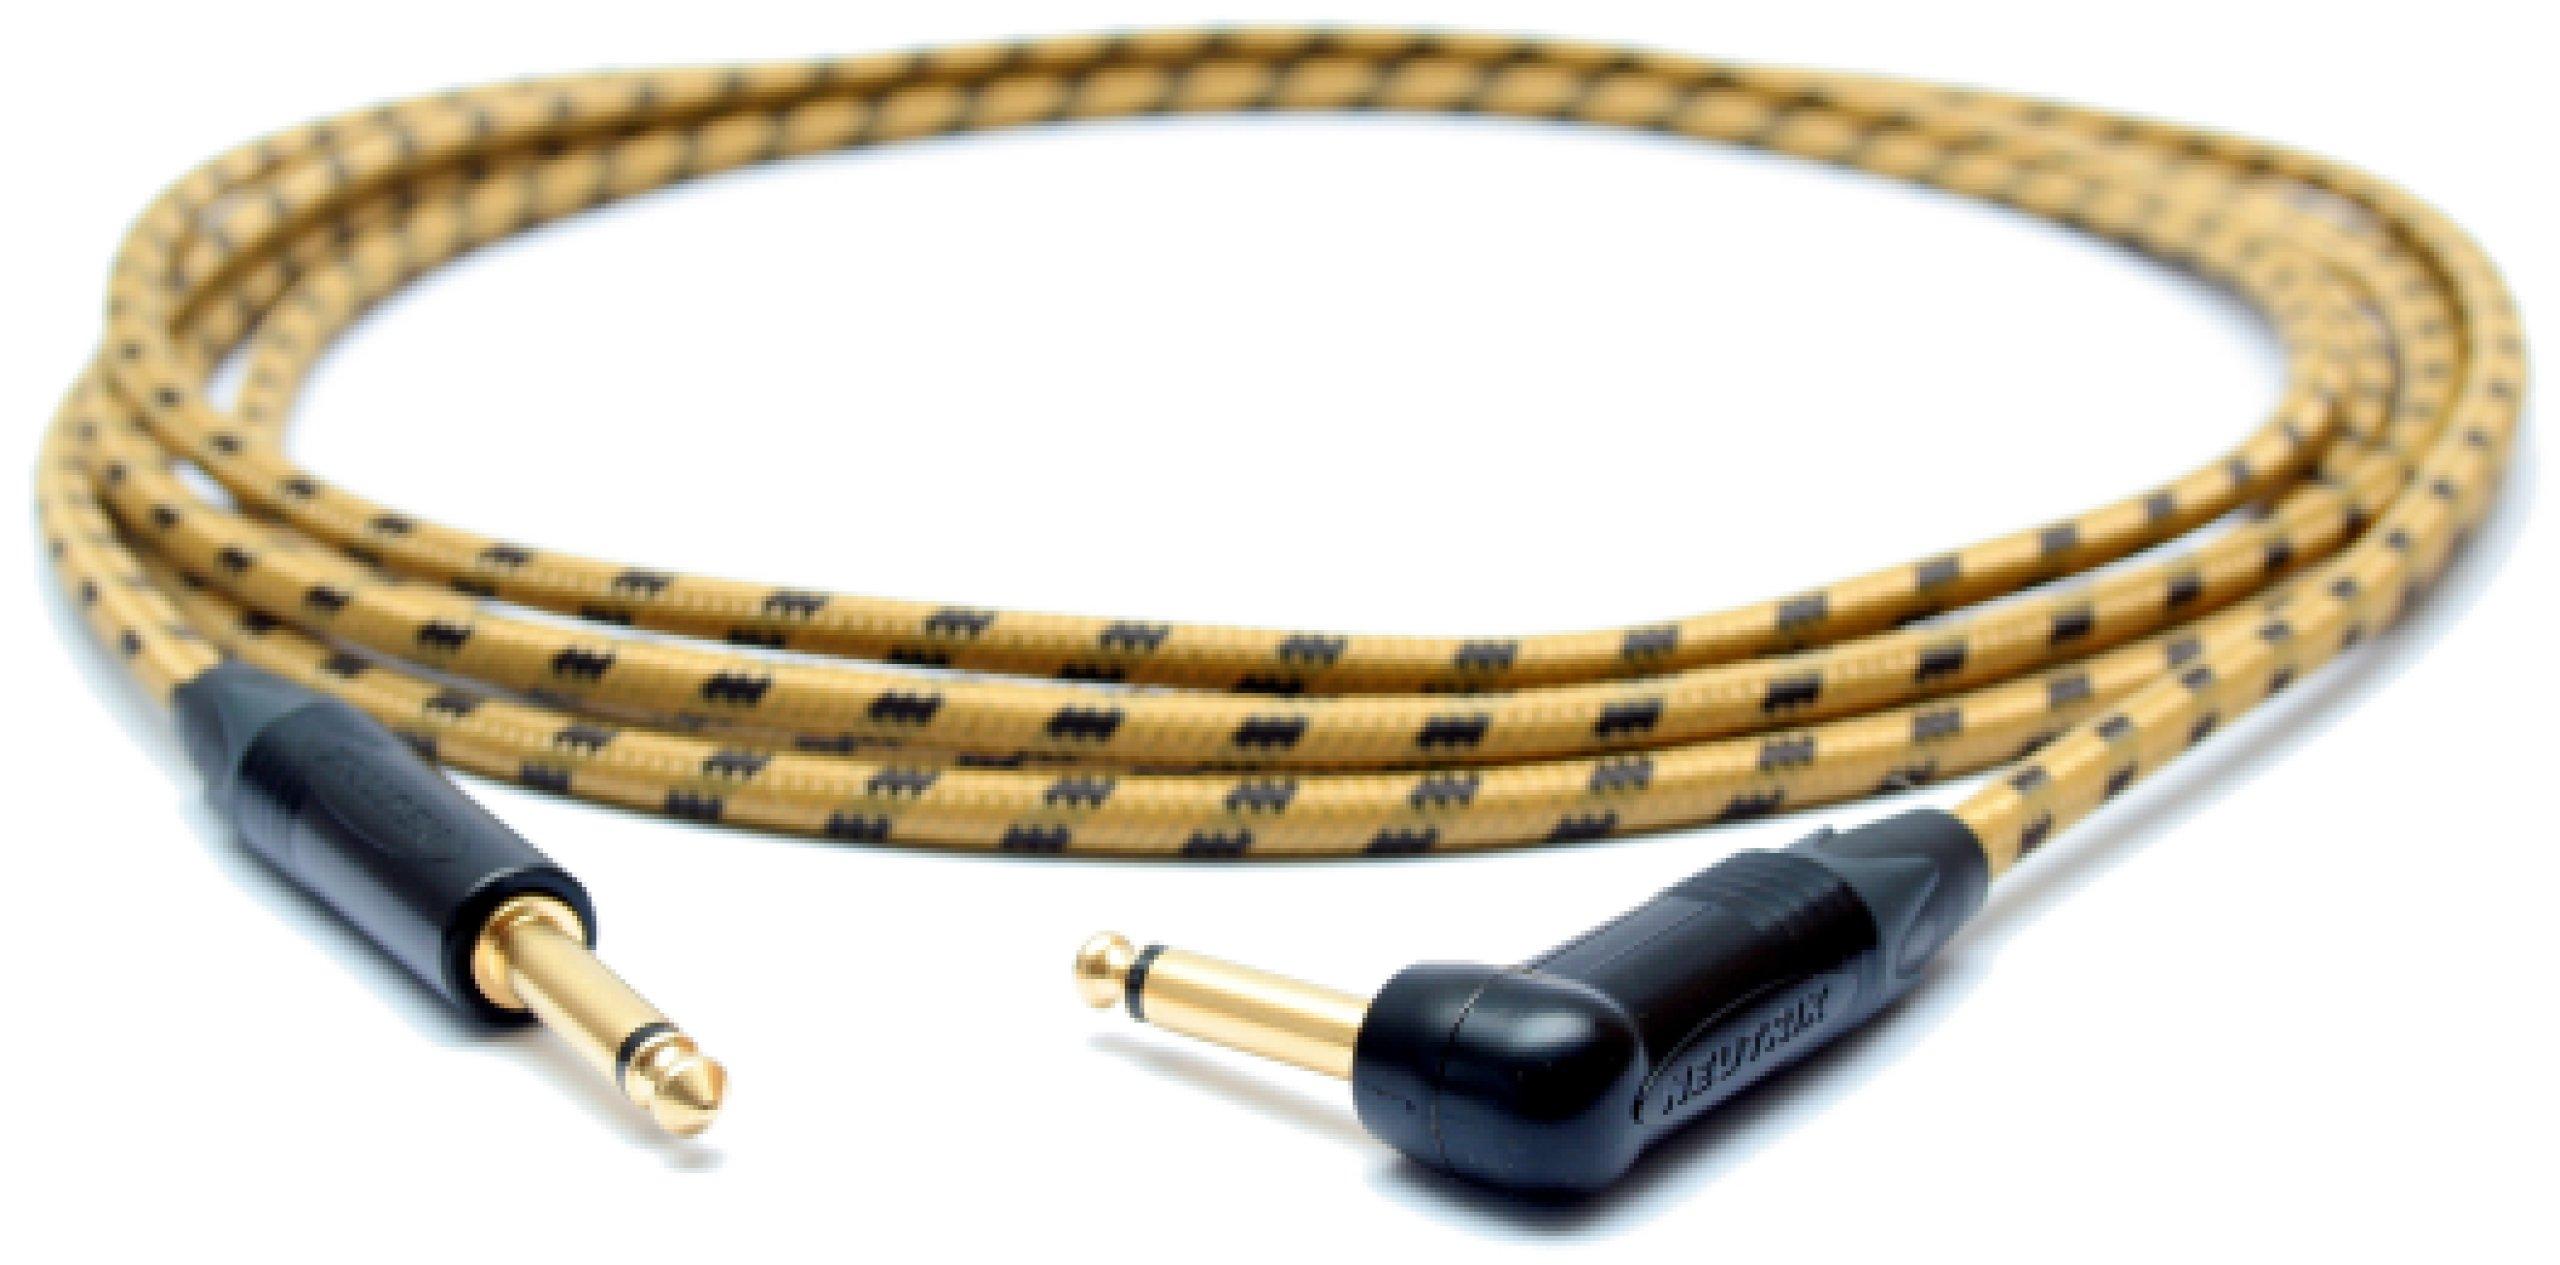 SOUNDSTAGE Kábel 3M GITARA KÁBEL vintage TWEED